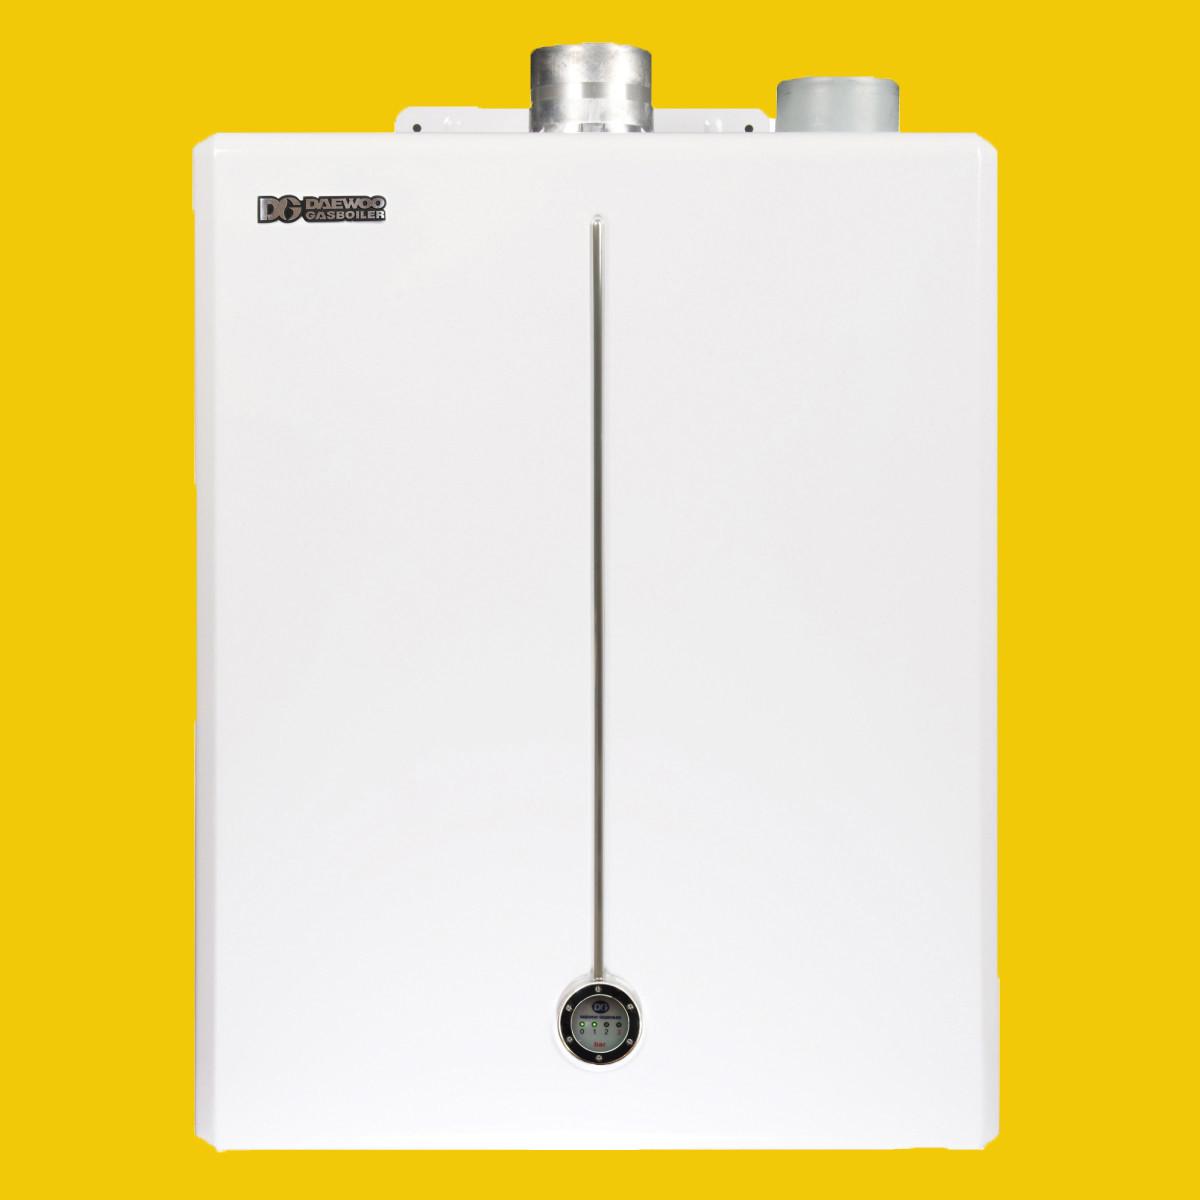 Газовый котел Daewoo DGB-350 MSC (40.7кВт)